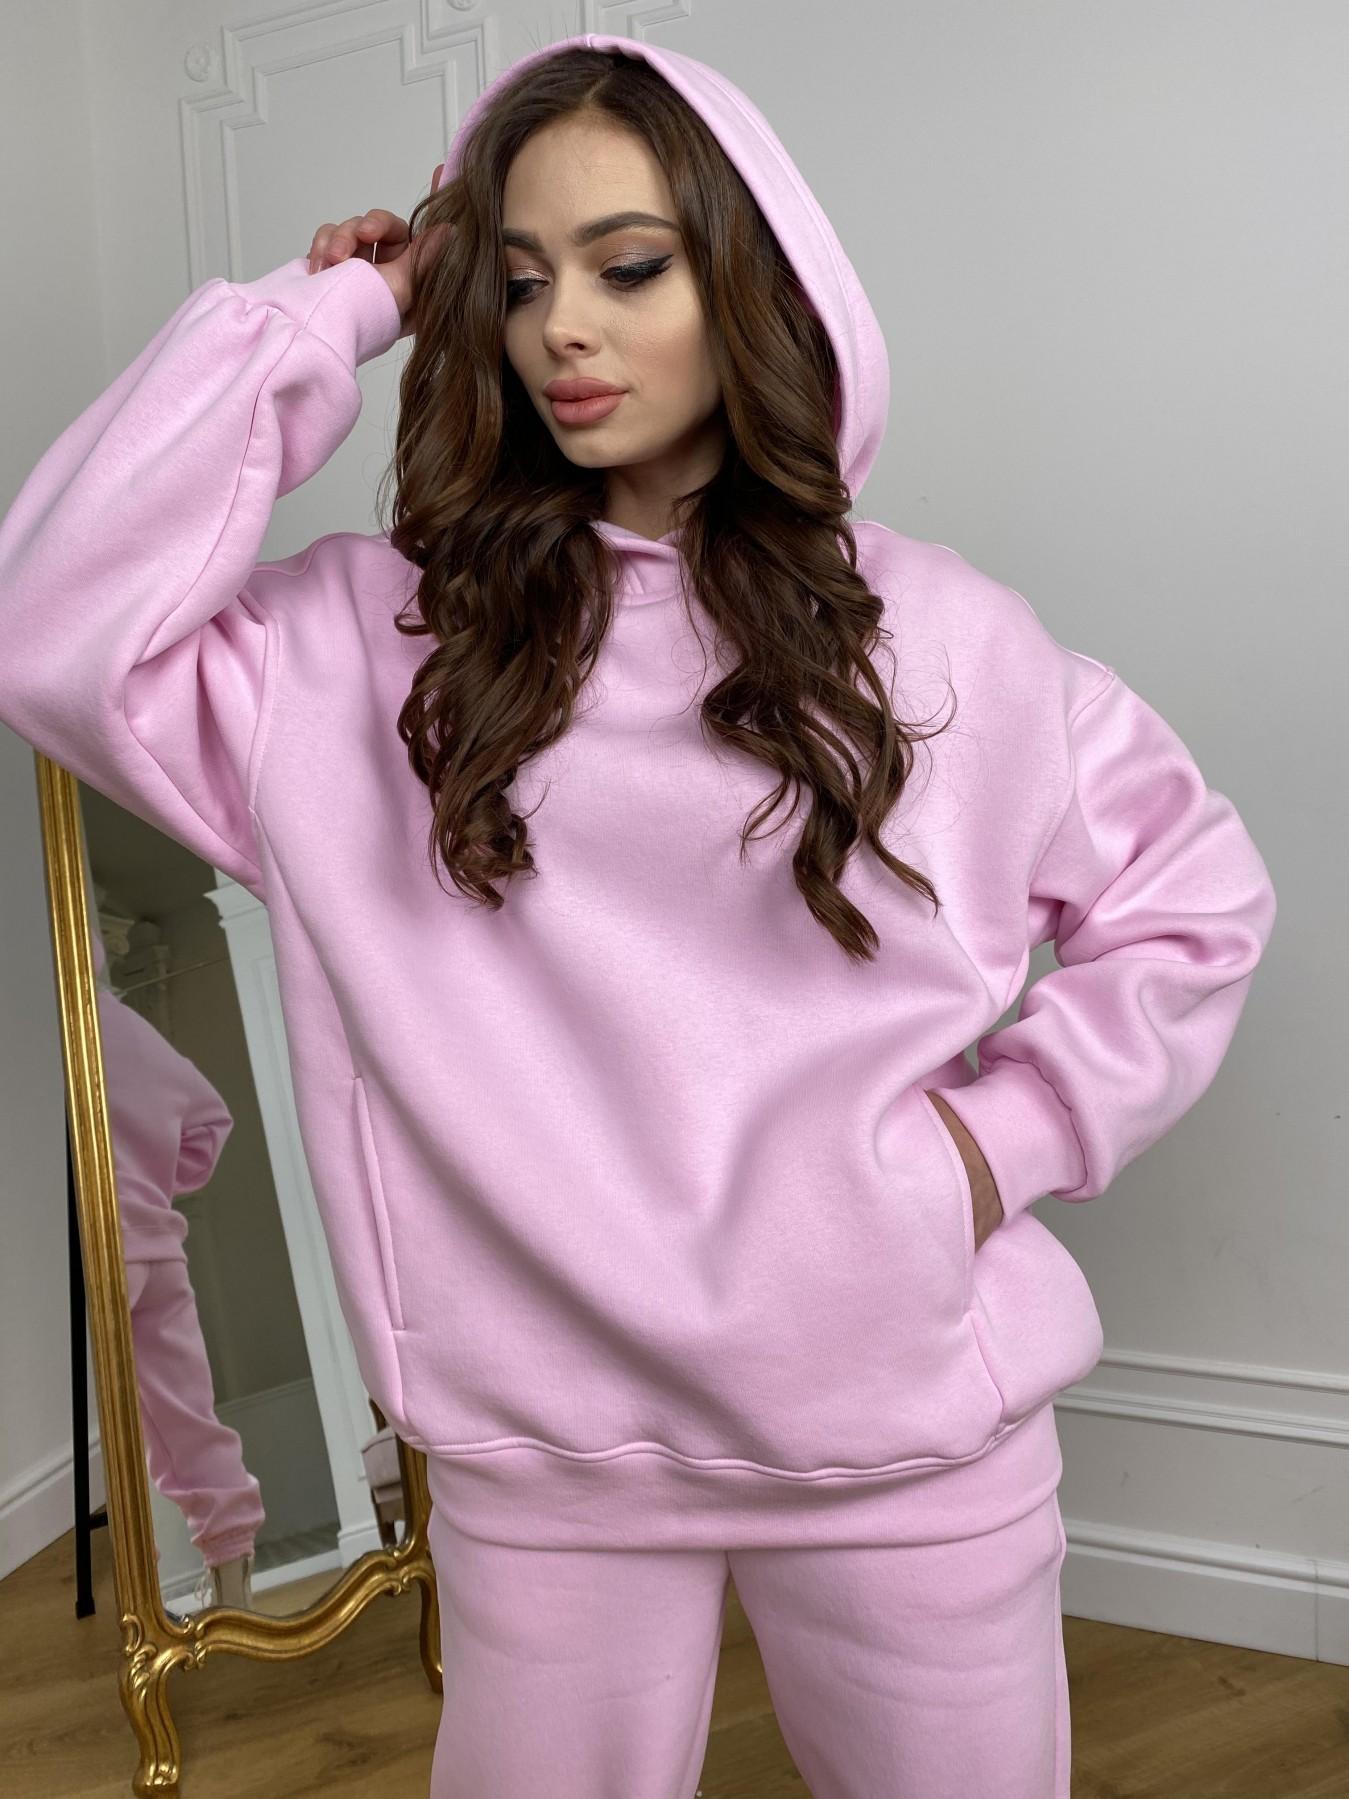 Марион костюм в  стиле Oversize  3х нитка 9651 АРТ. 46922 Цвет: Розовый - фото 5, интернет магазин tm-modus.ru